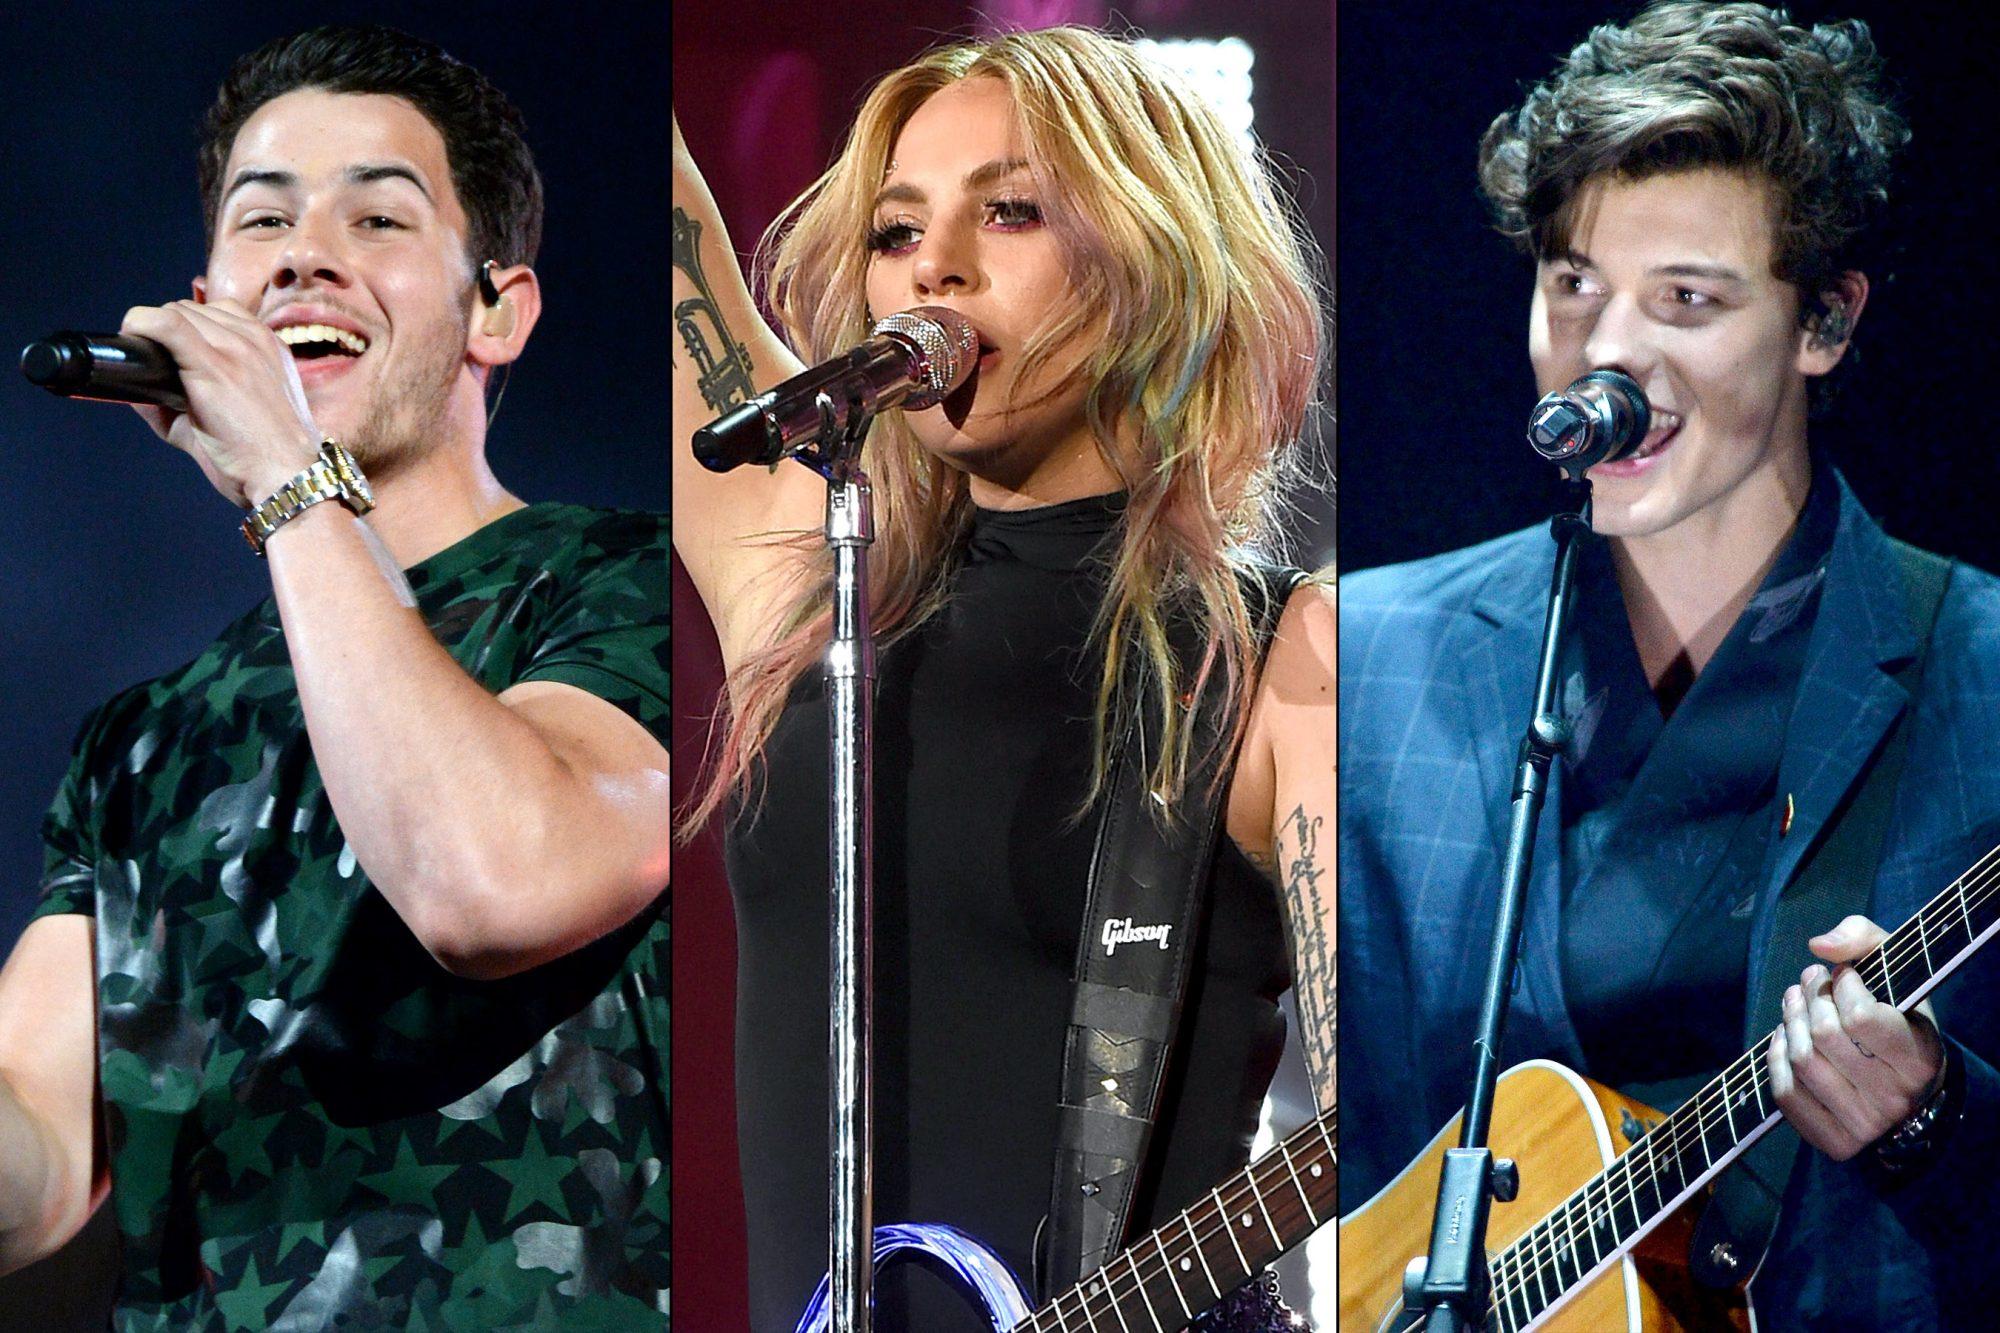 Nick Jonas / Lady Gaga / Shawn Mendez